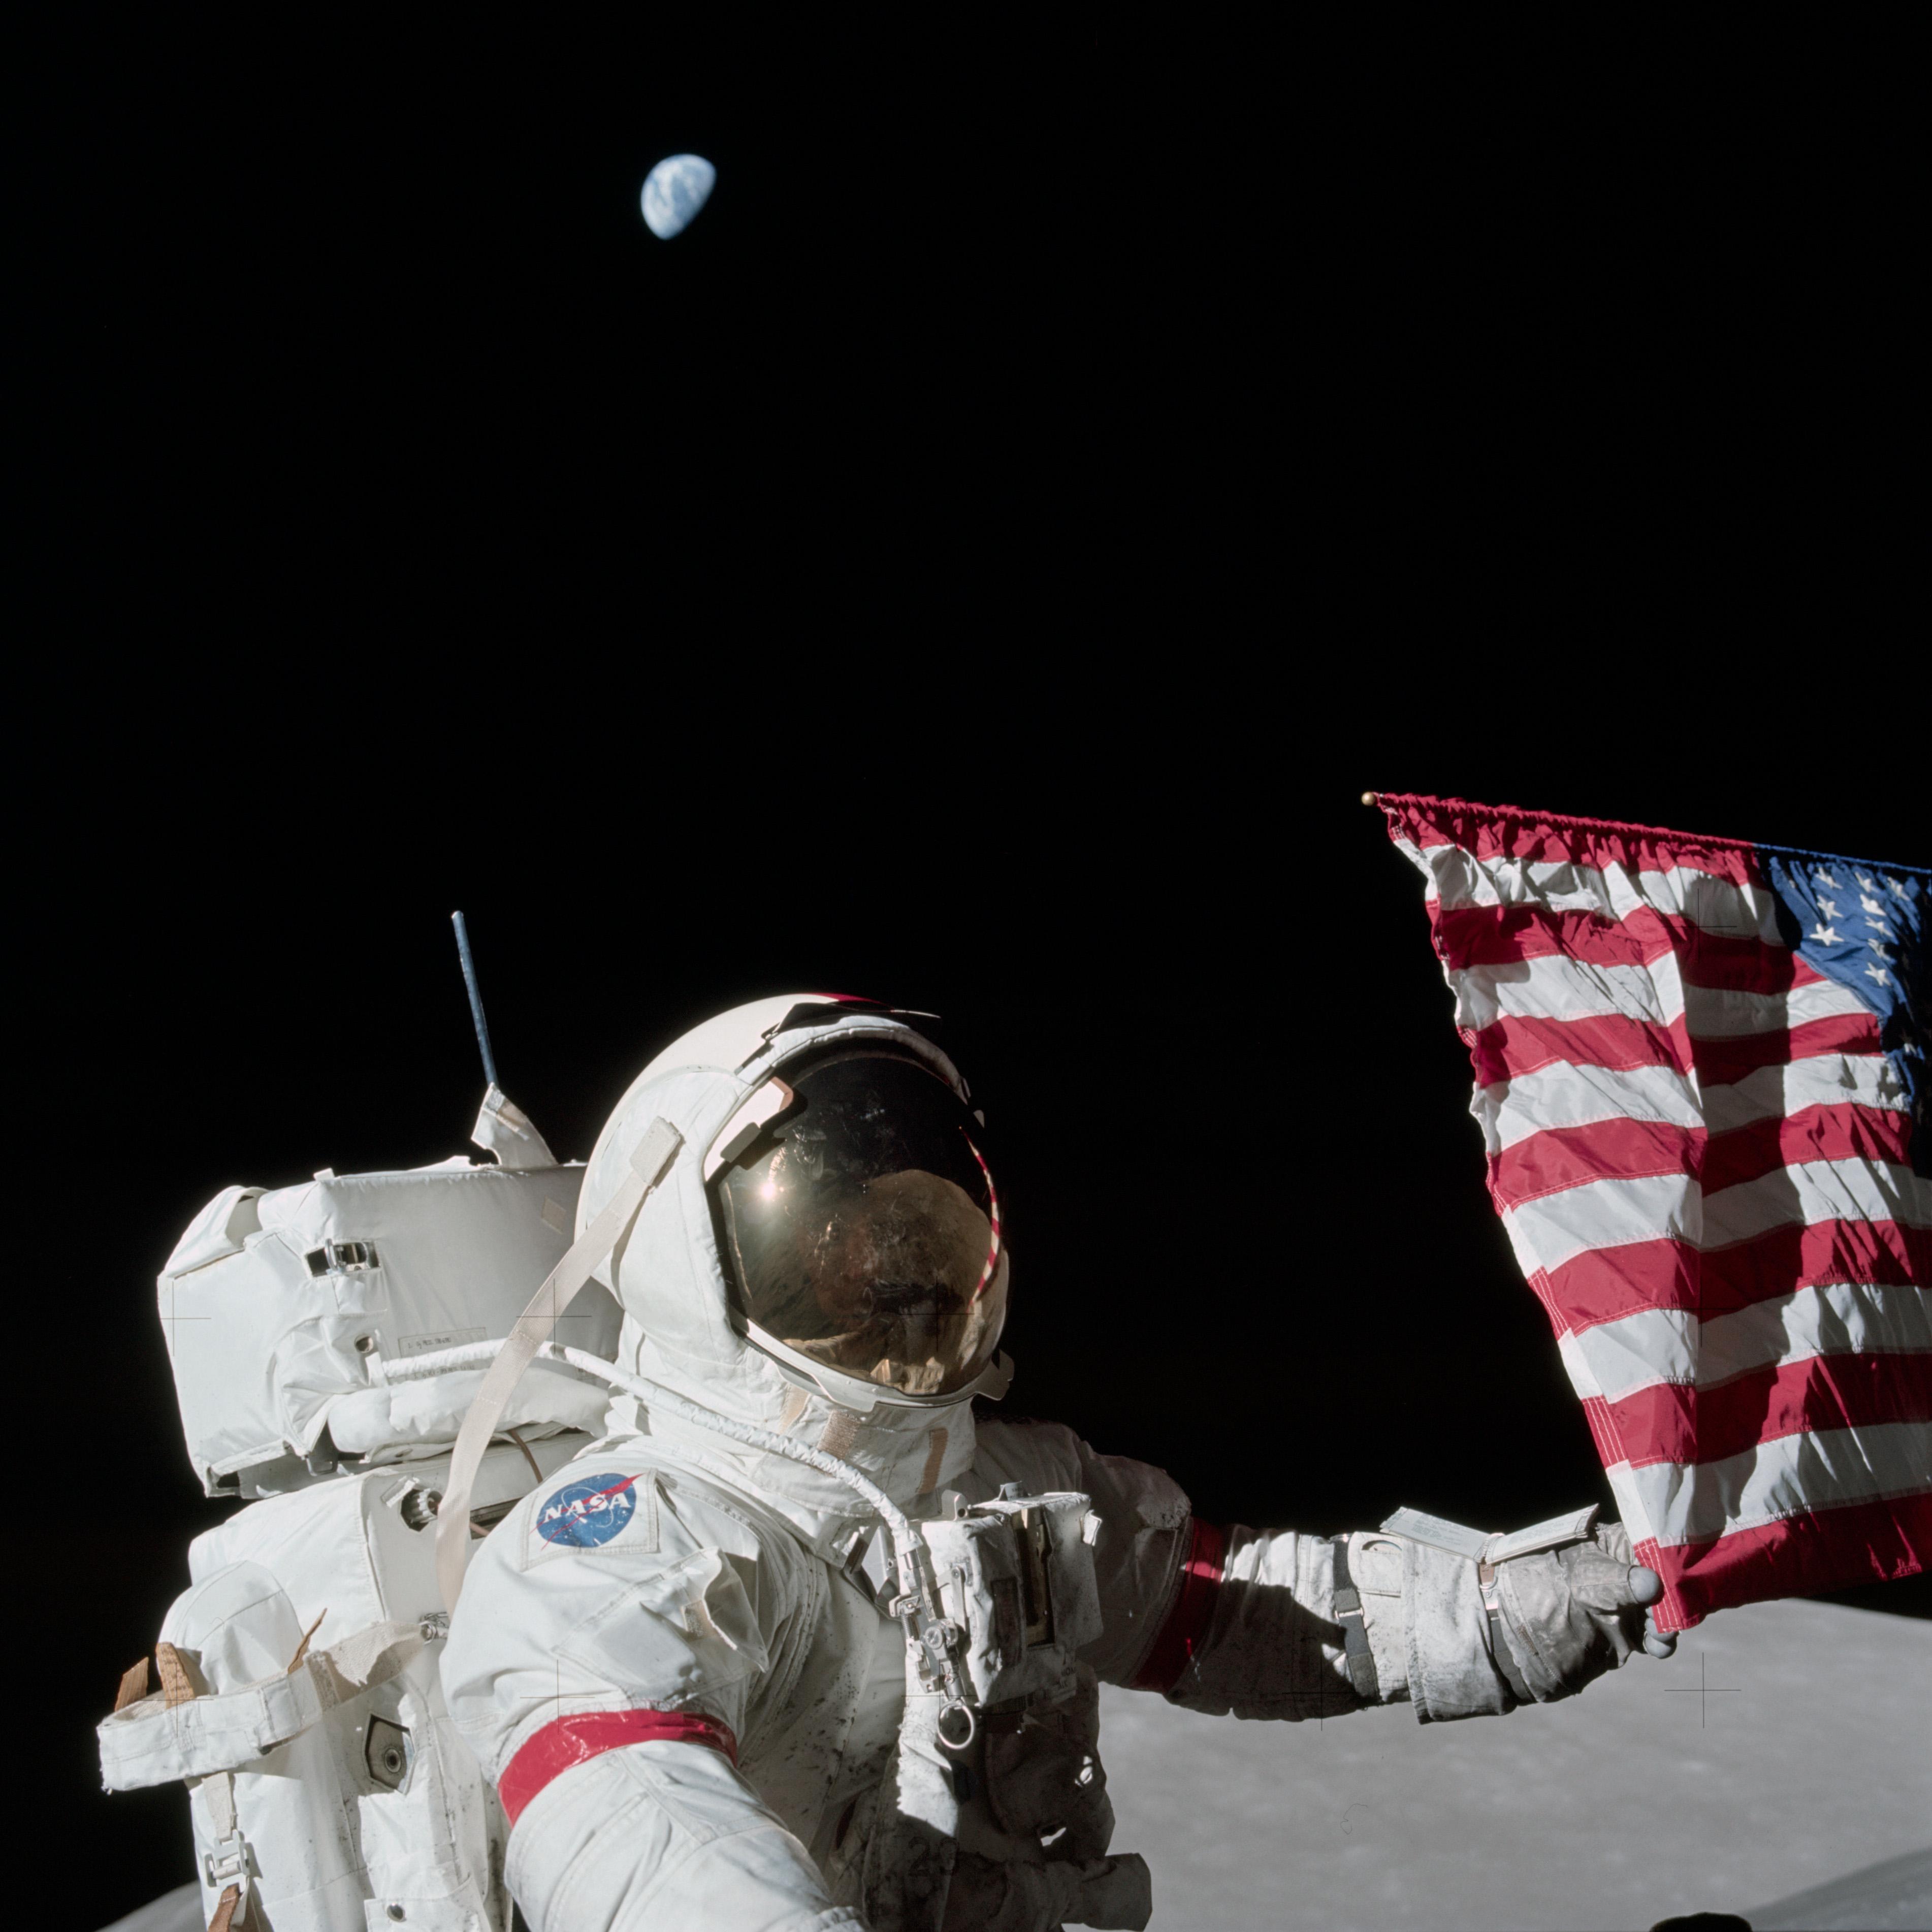 http://upload.wikimedia.org/wikipedia/commons/e/e1/Apollo17.jpg